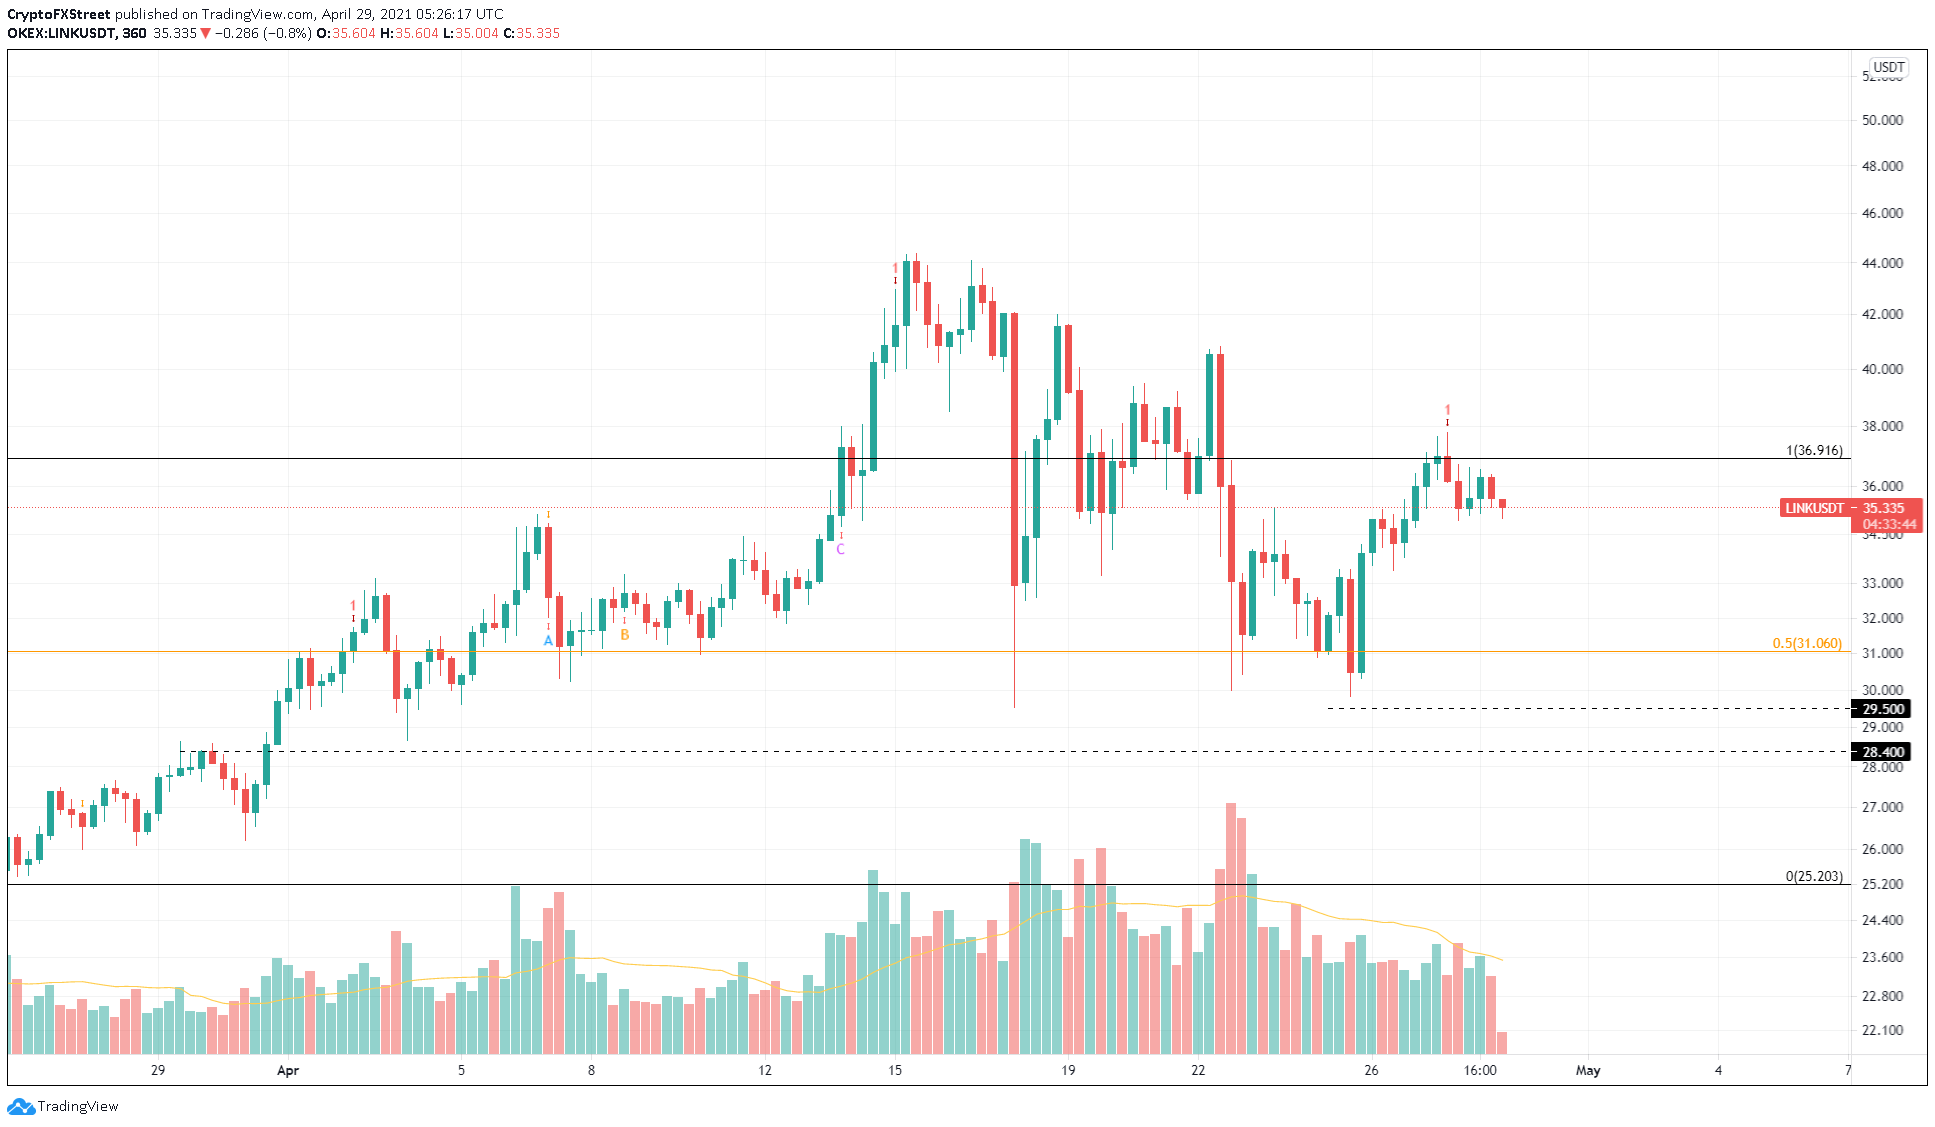 LINK/USDT 6-hour chart